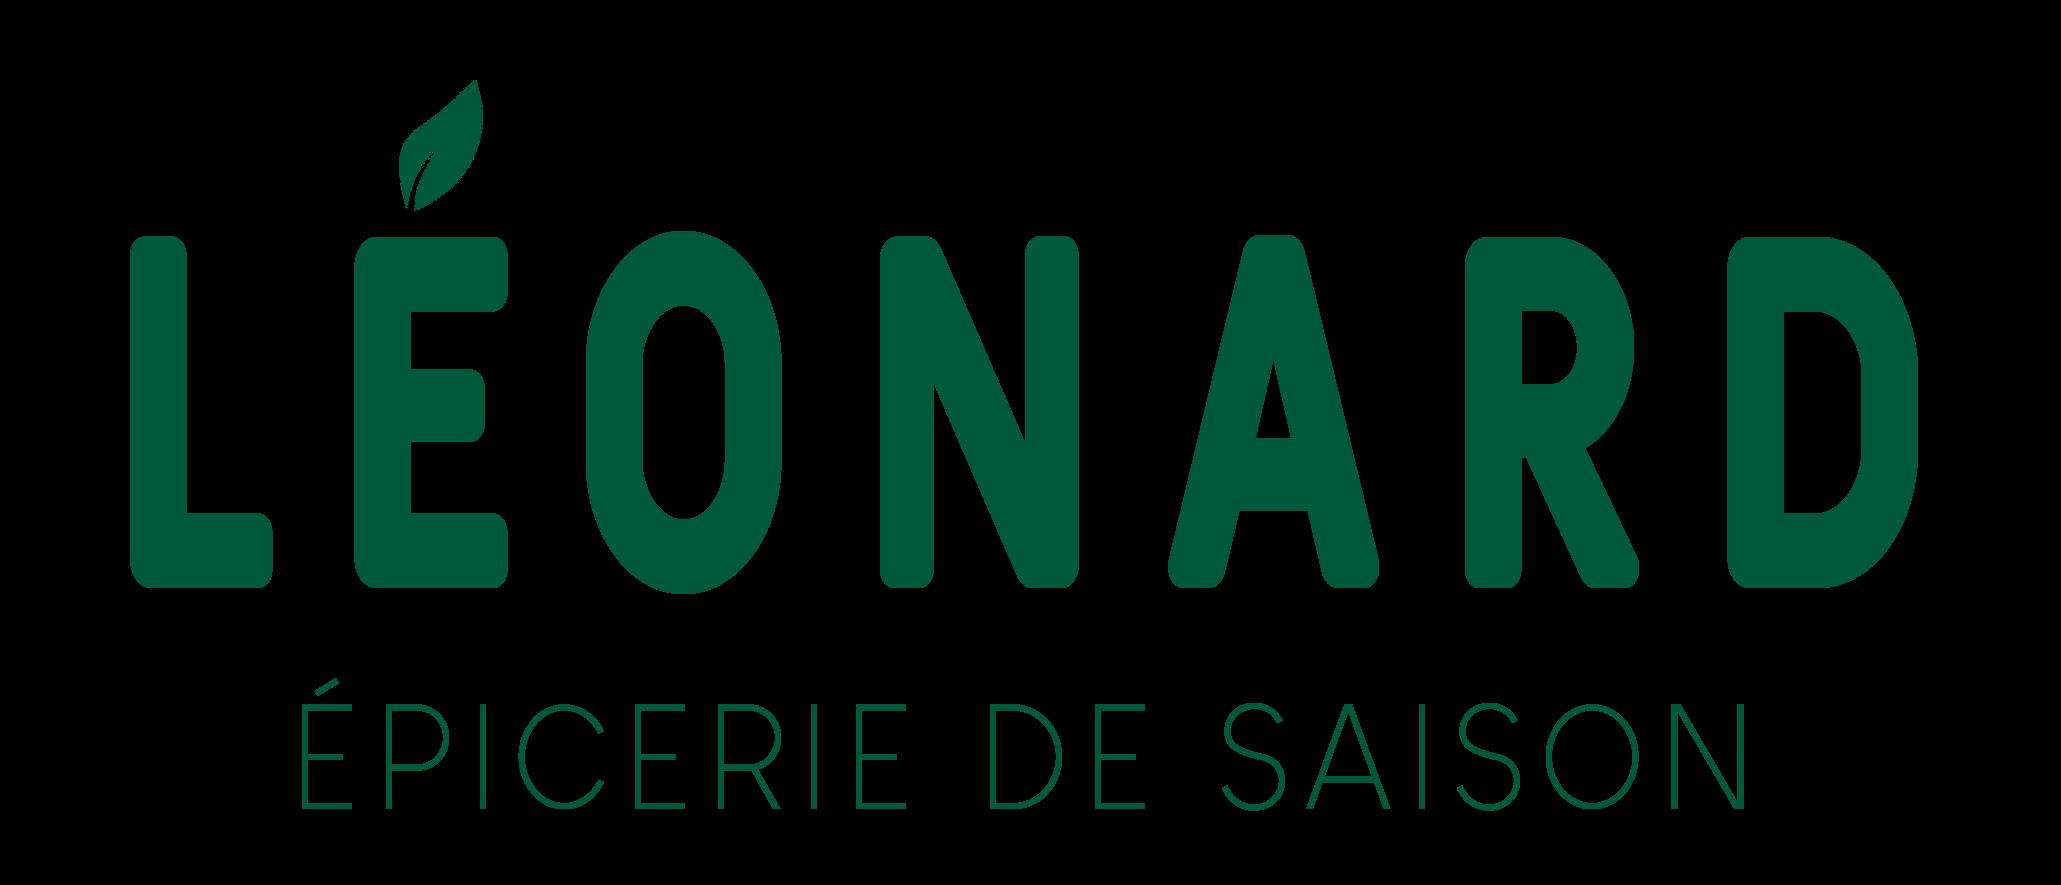 Épicerie Léonard